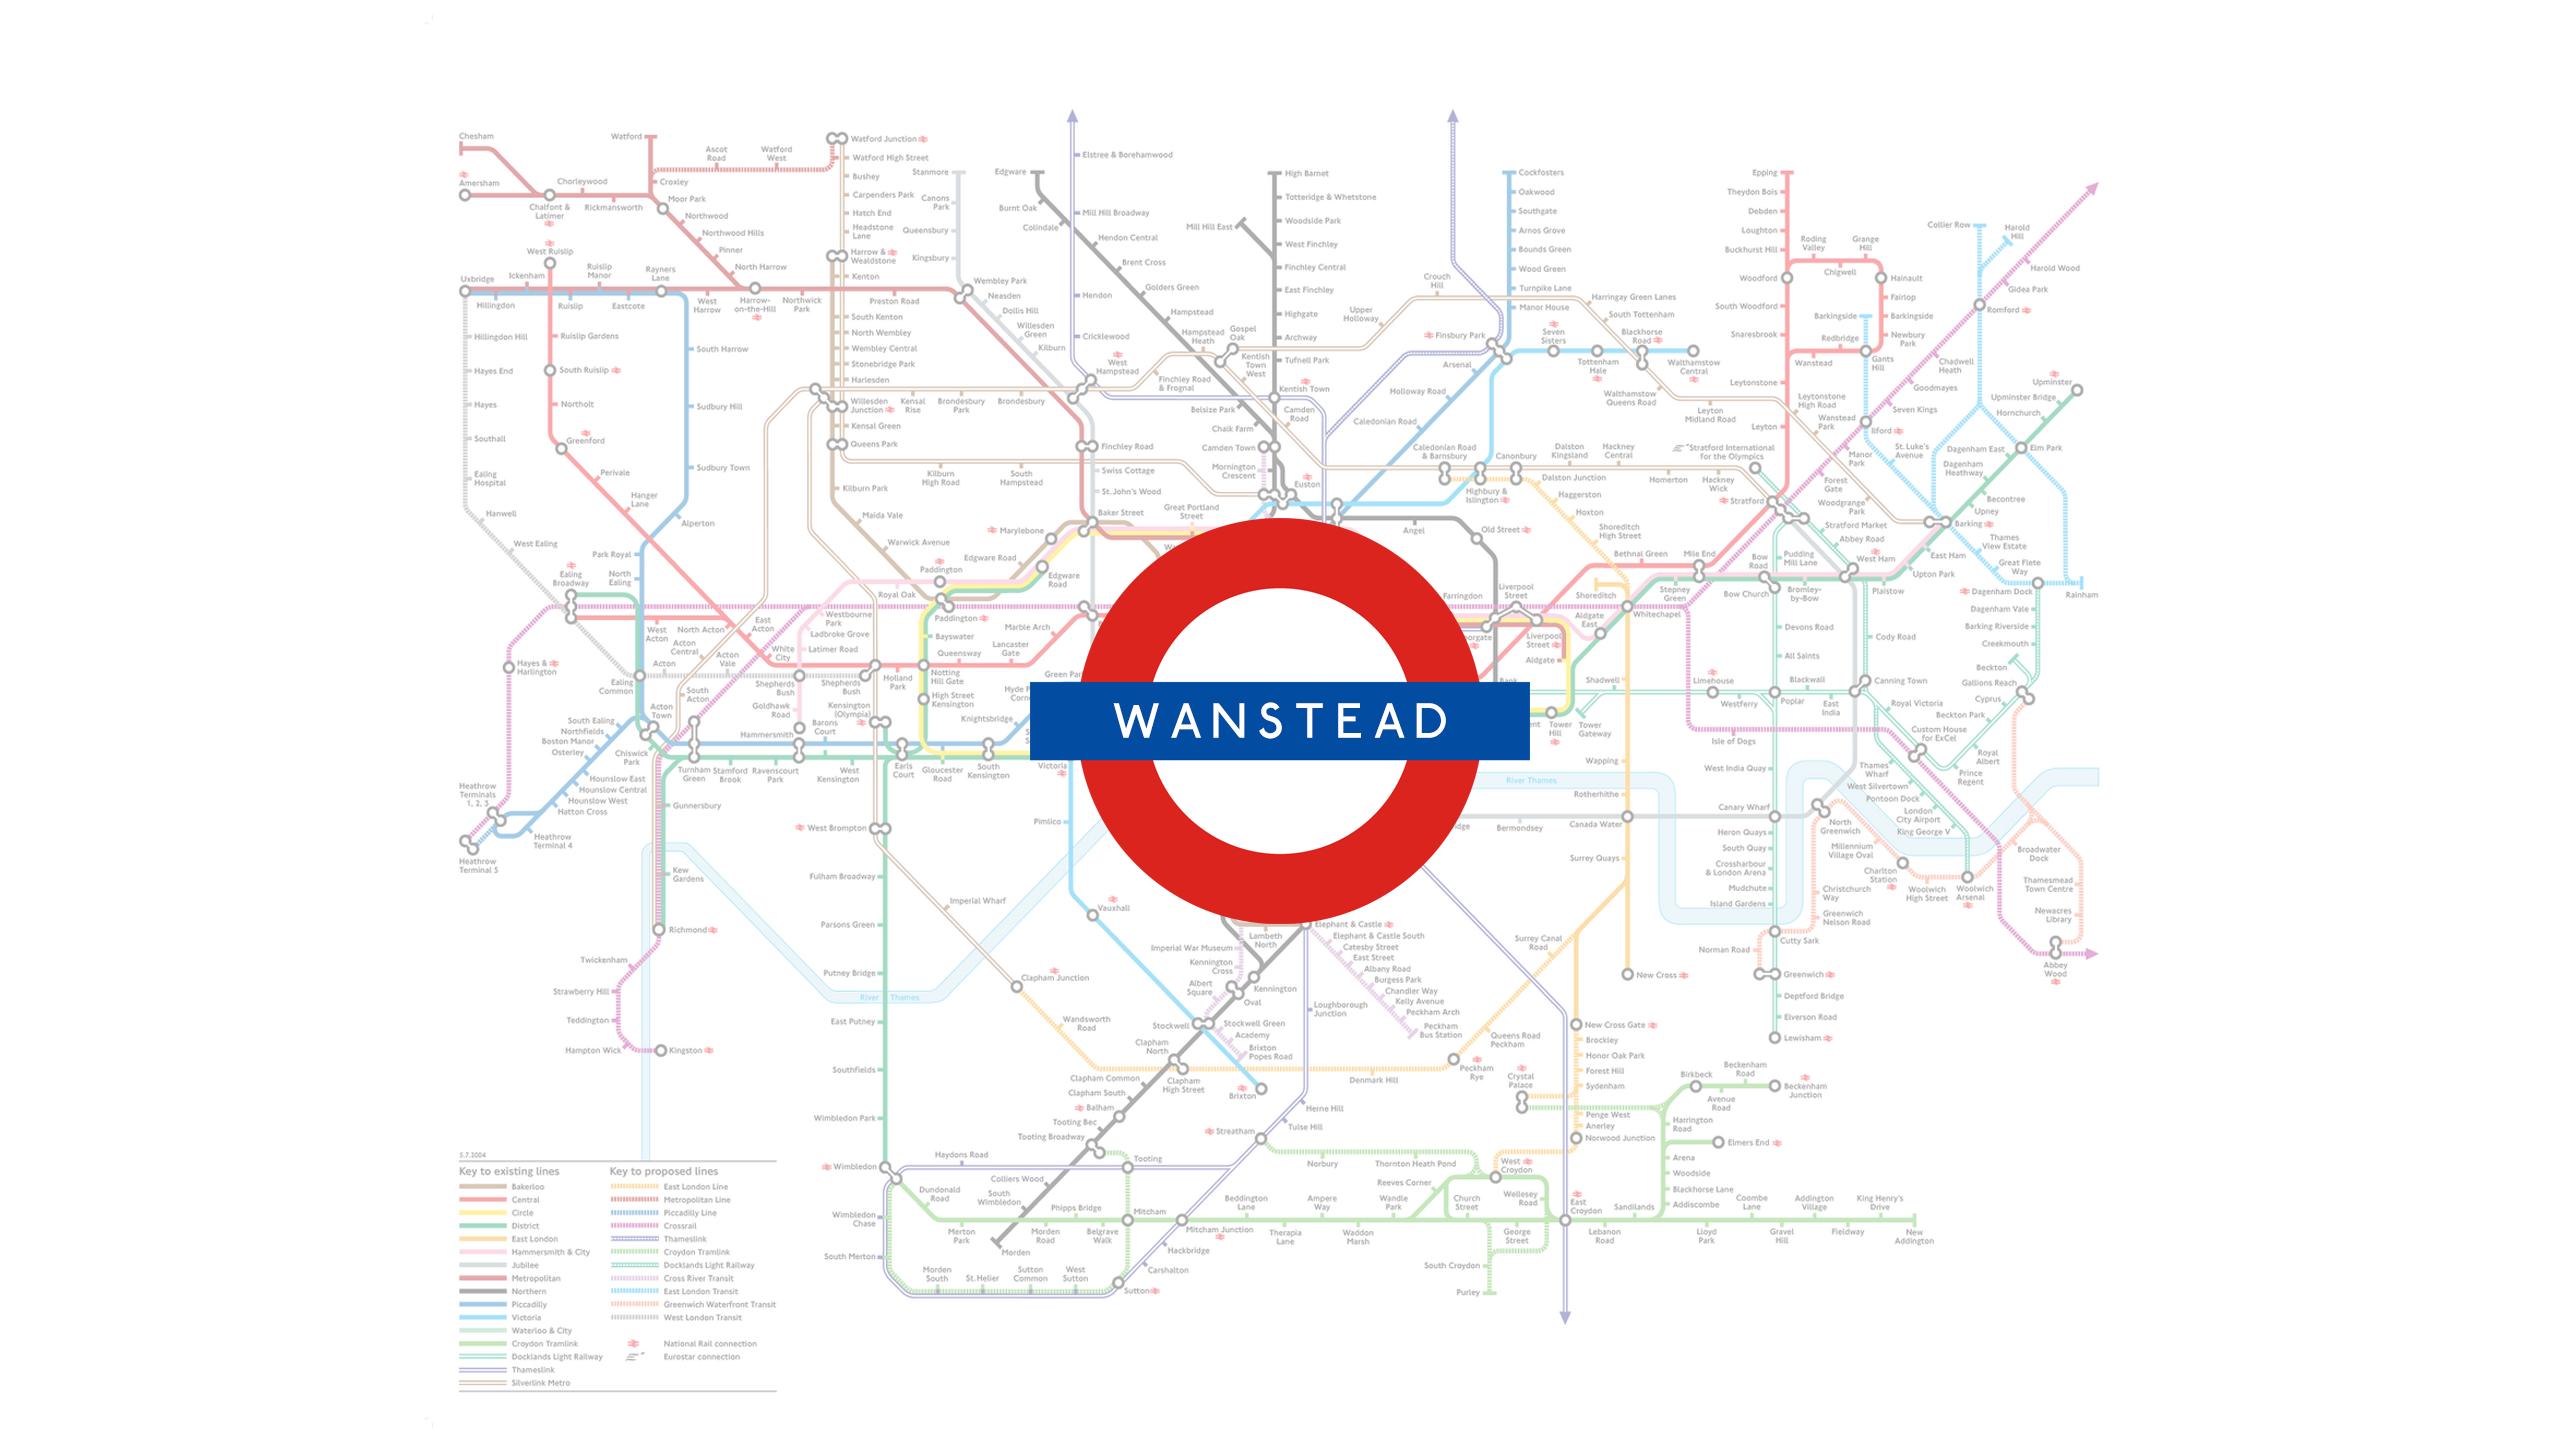 Wanstead (Map)